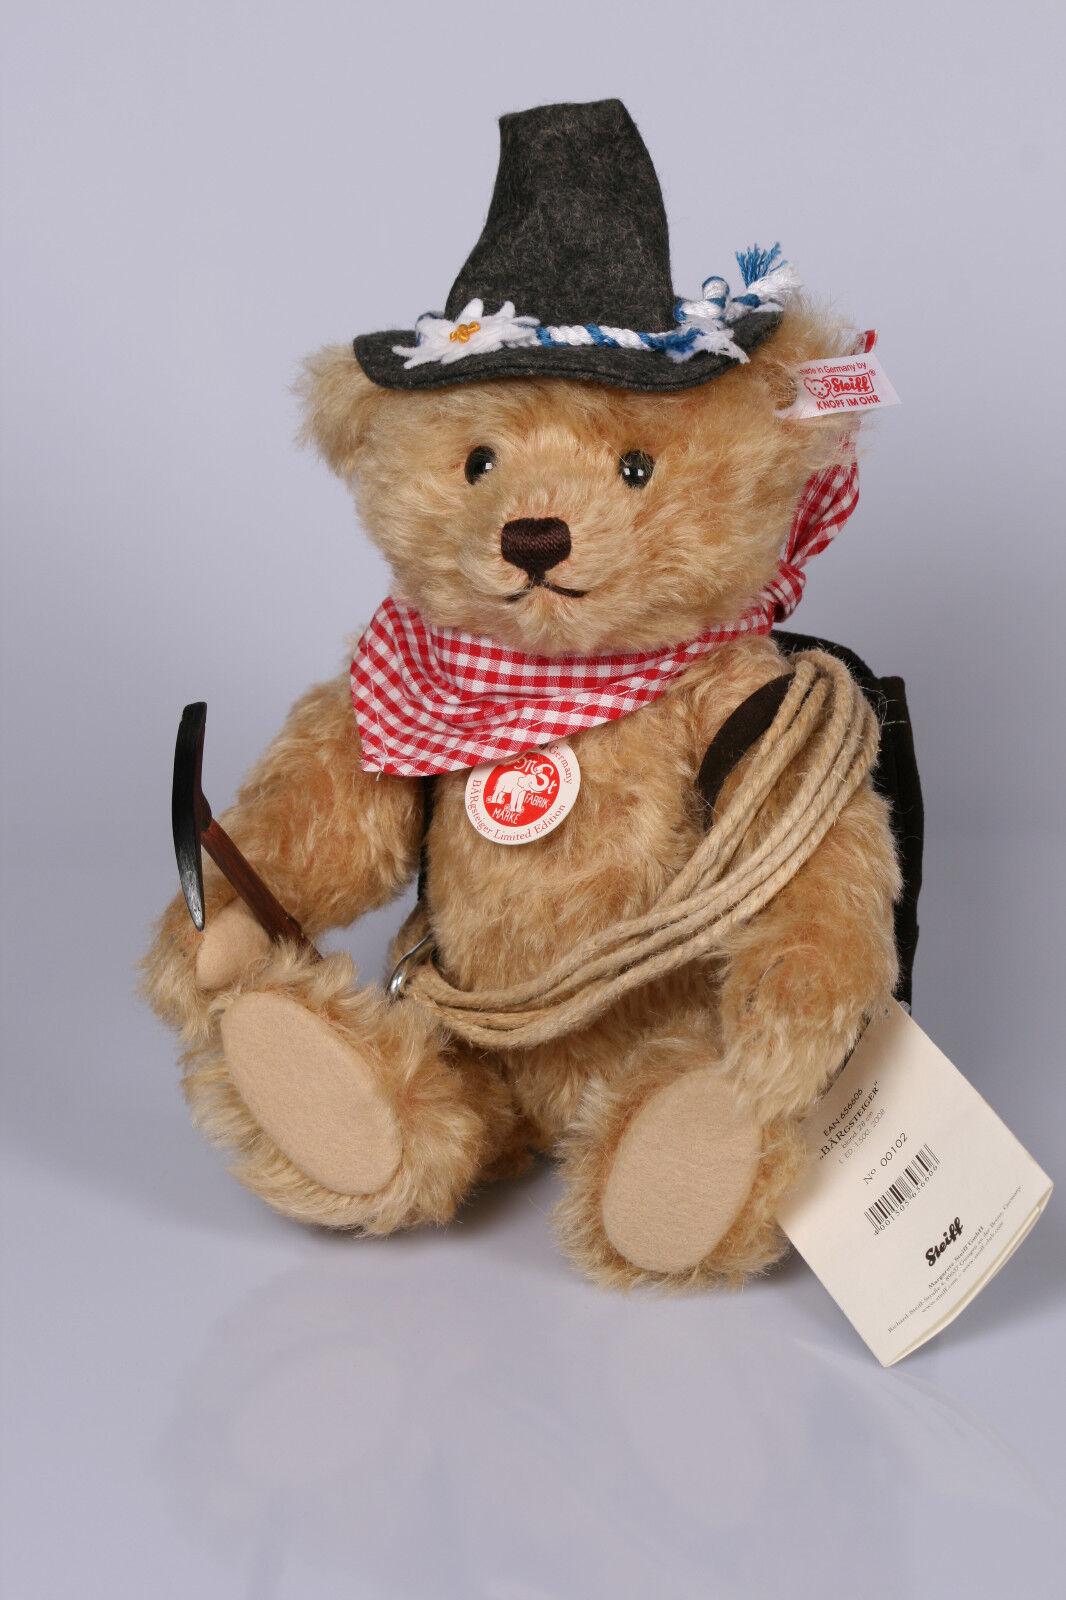 STEIFF BÄRGsteiger Teddy, Teddybär, für Sammler, blond, limitiert, NEU